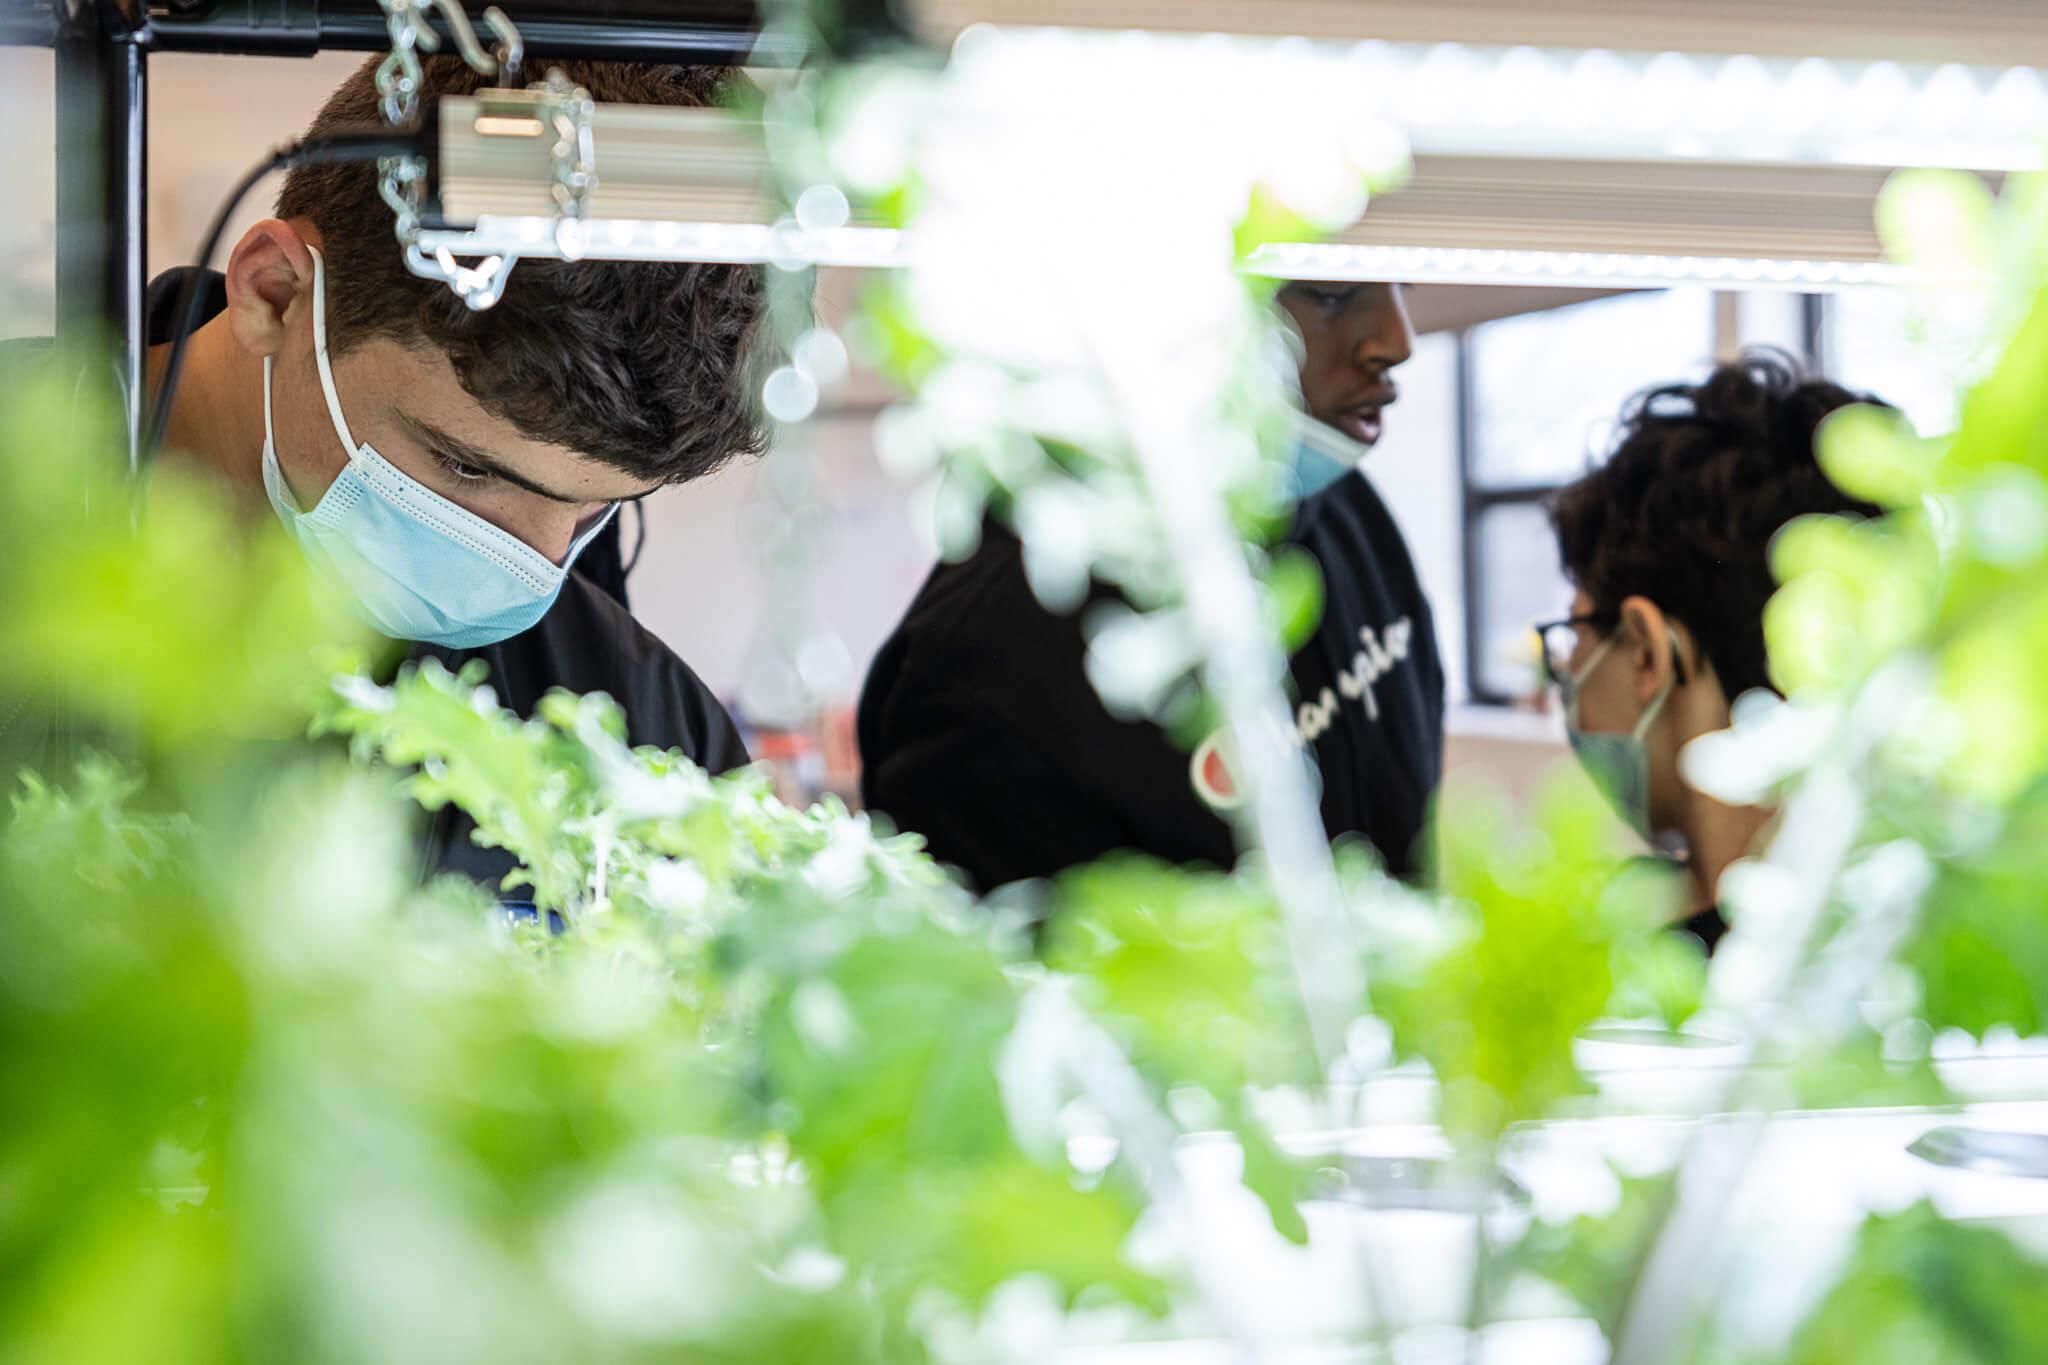 vireo hydroponic garden for children